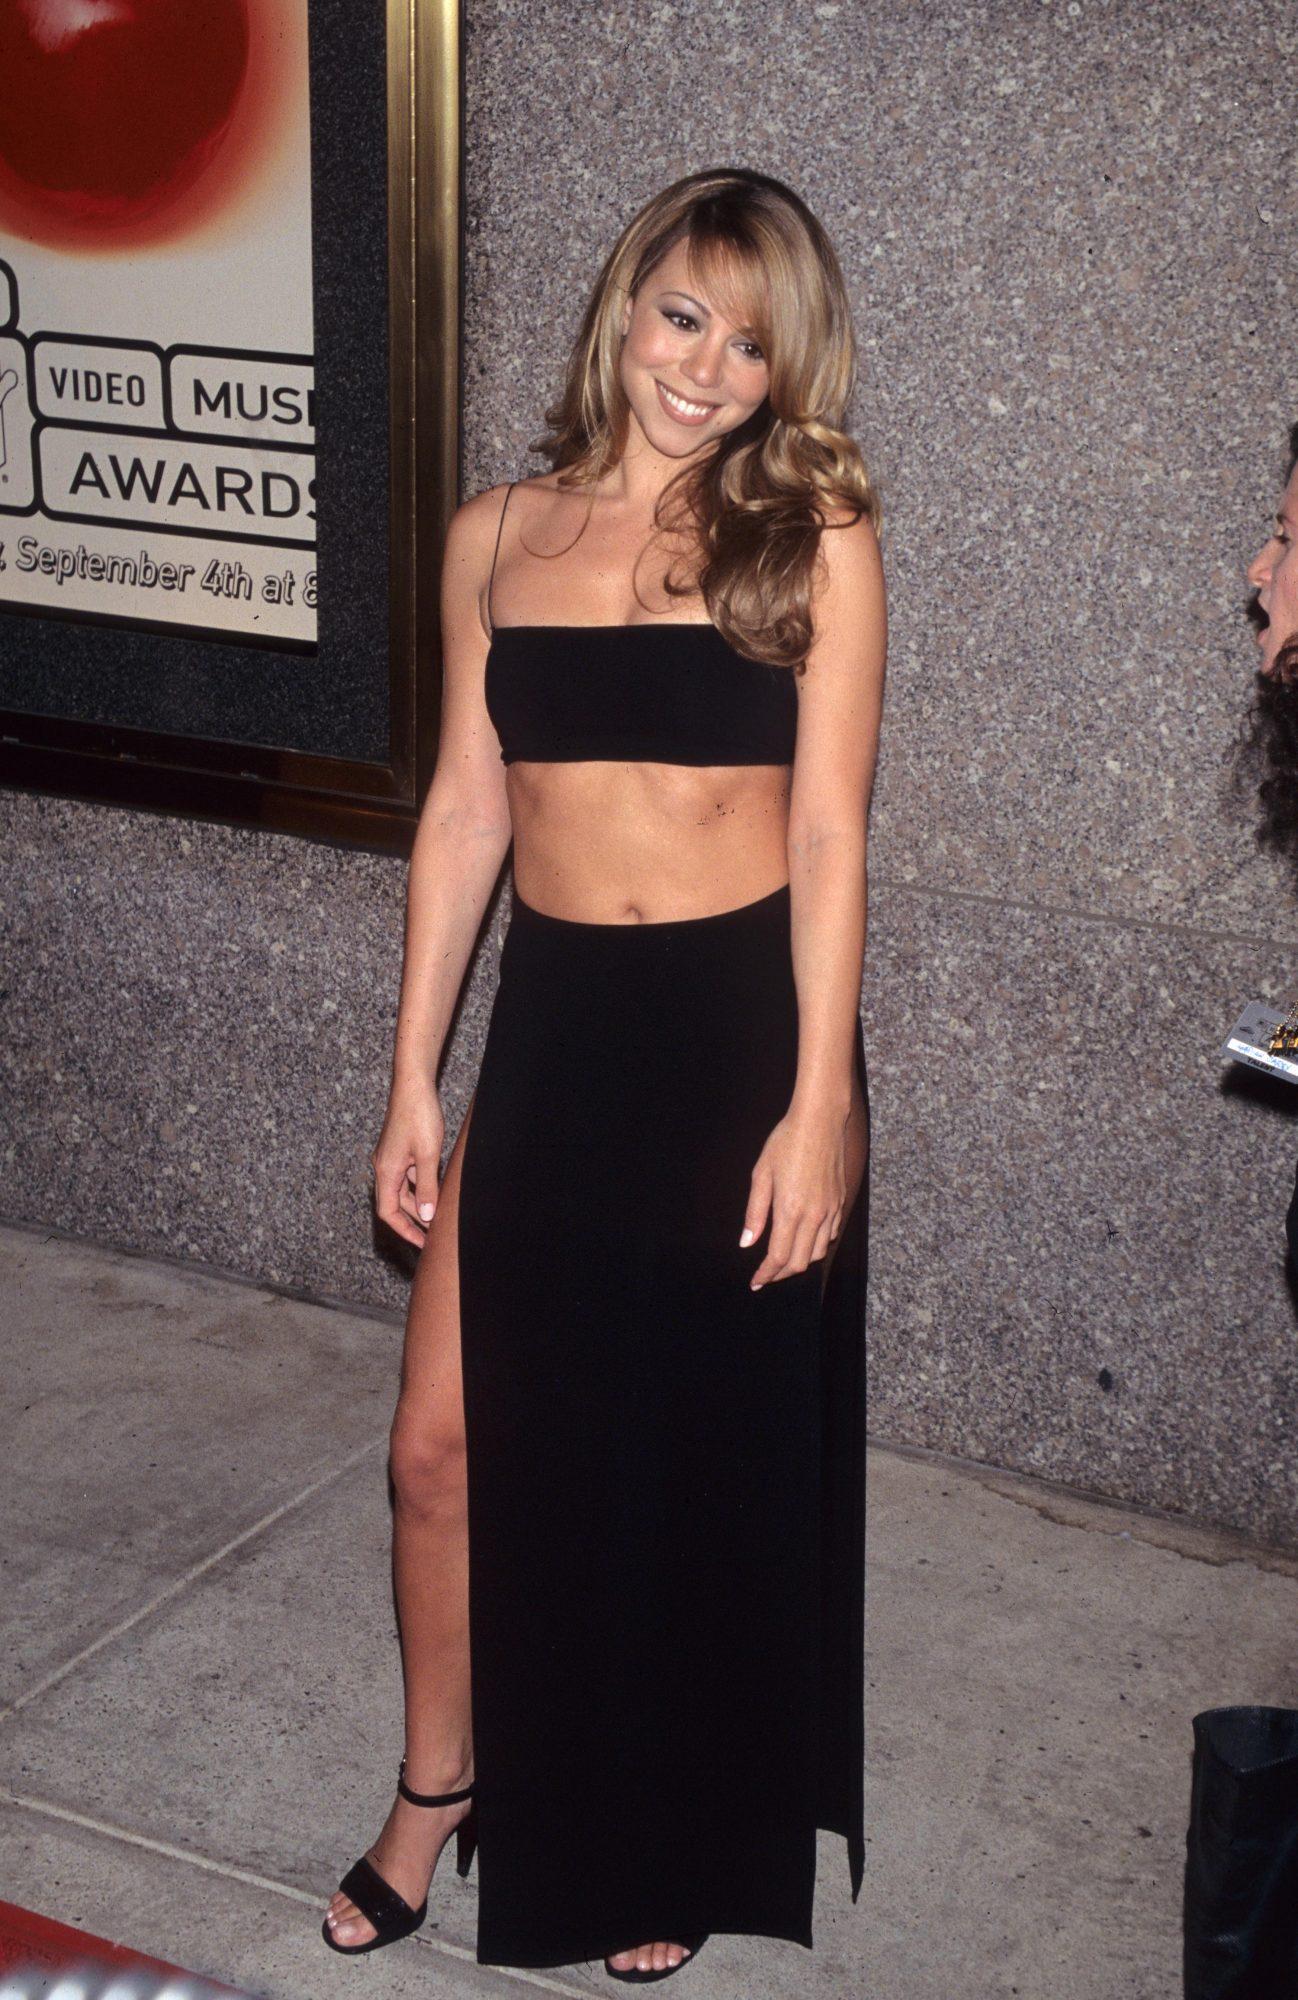 Mariah-Carey-MTV-Video-Music-Awards.jpg